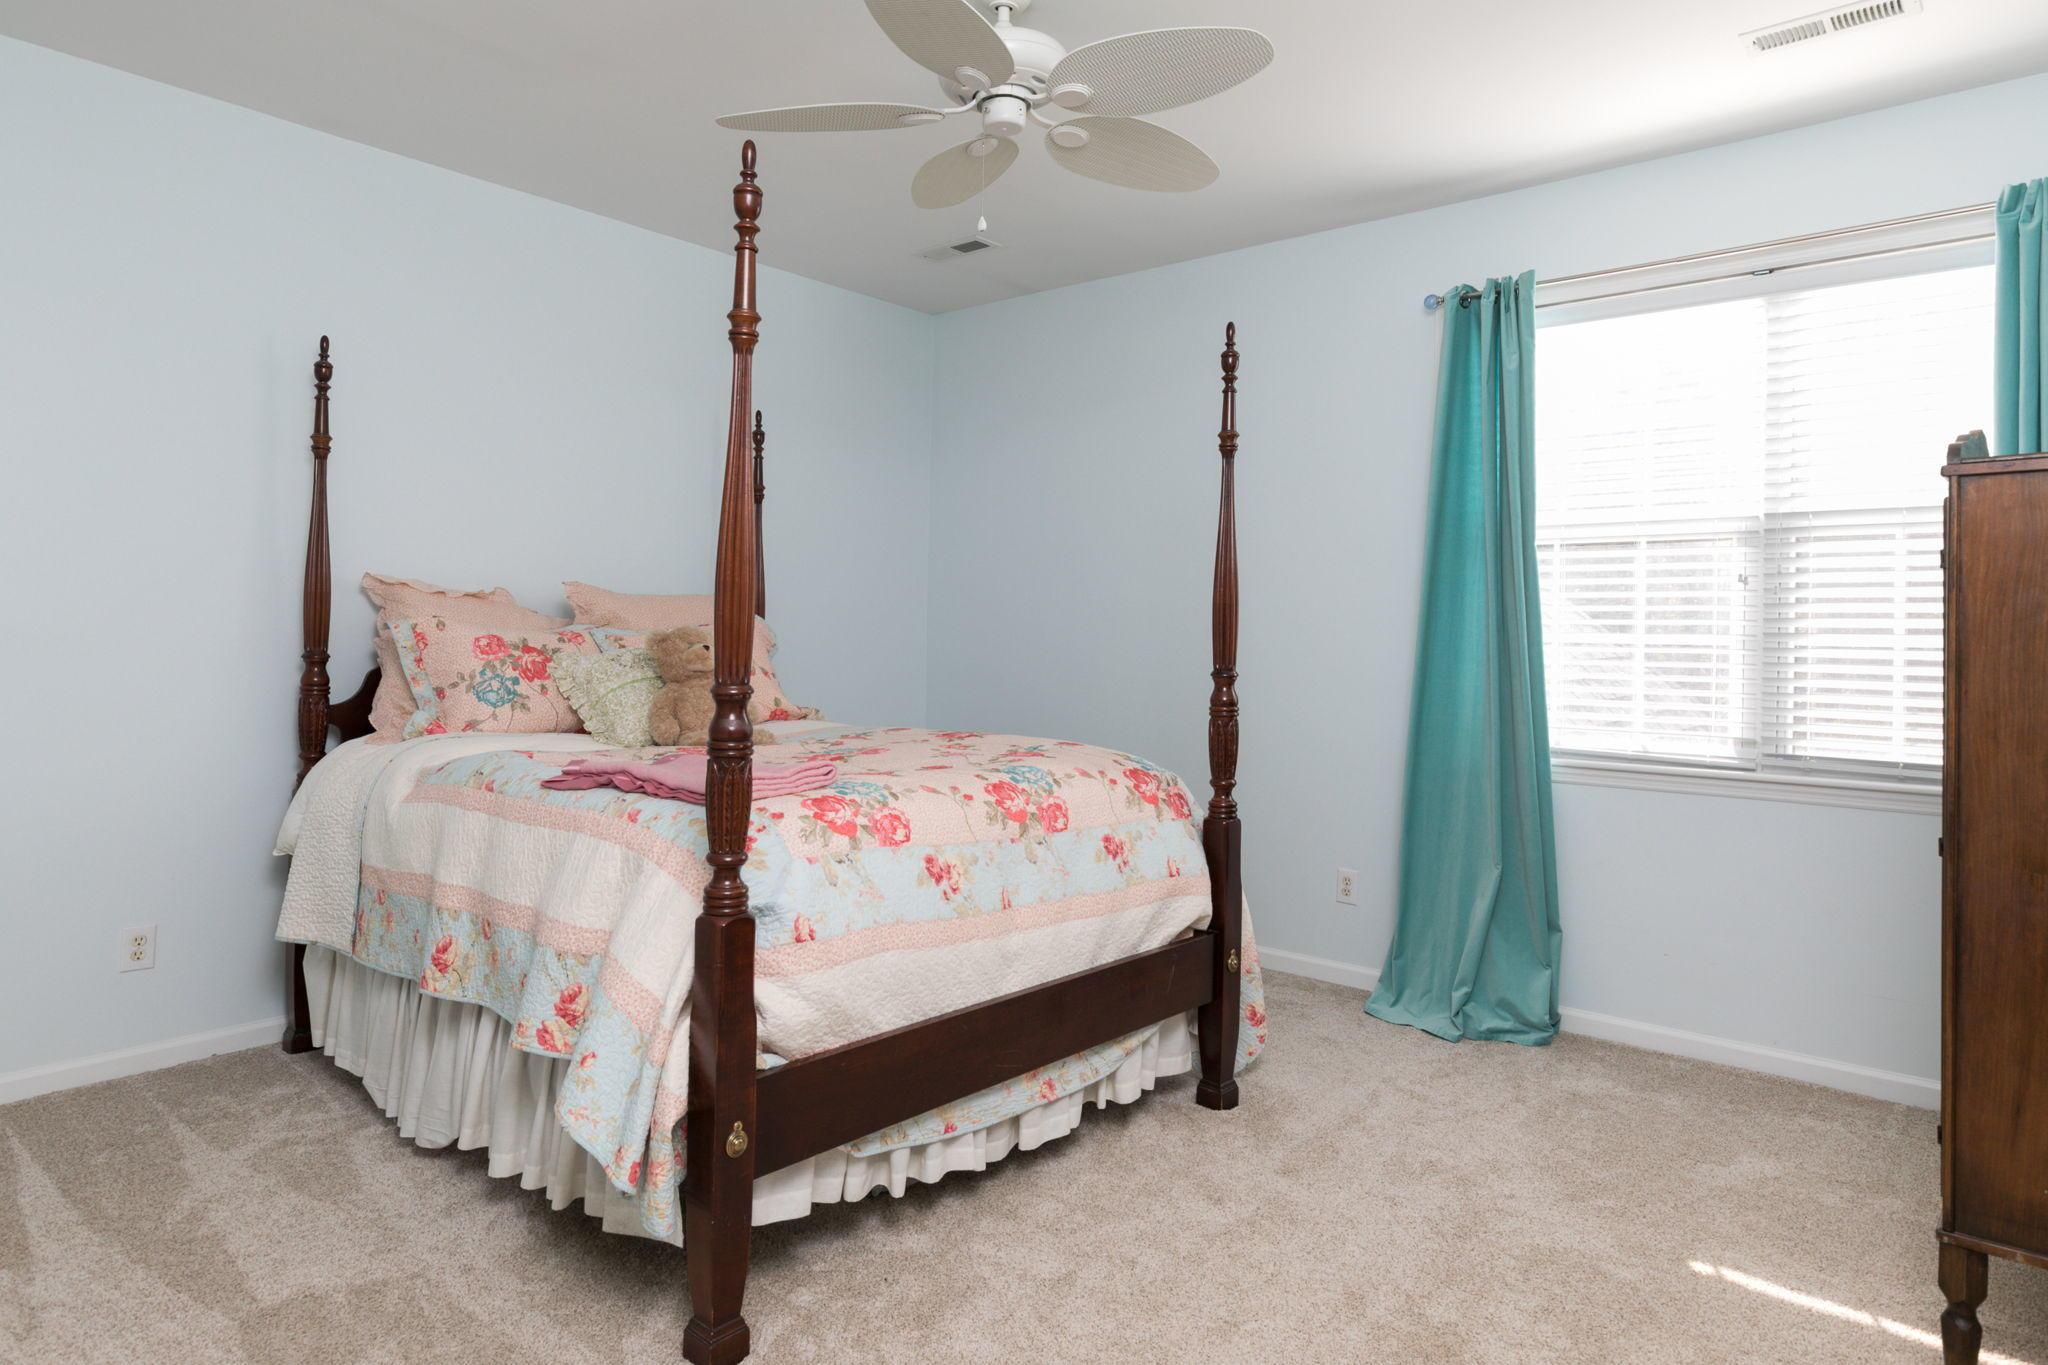 Dunes West Homes For Sale - 3625 Colonel Vanderhorst, Mount Pleasant, SC - 8